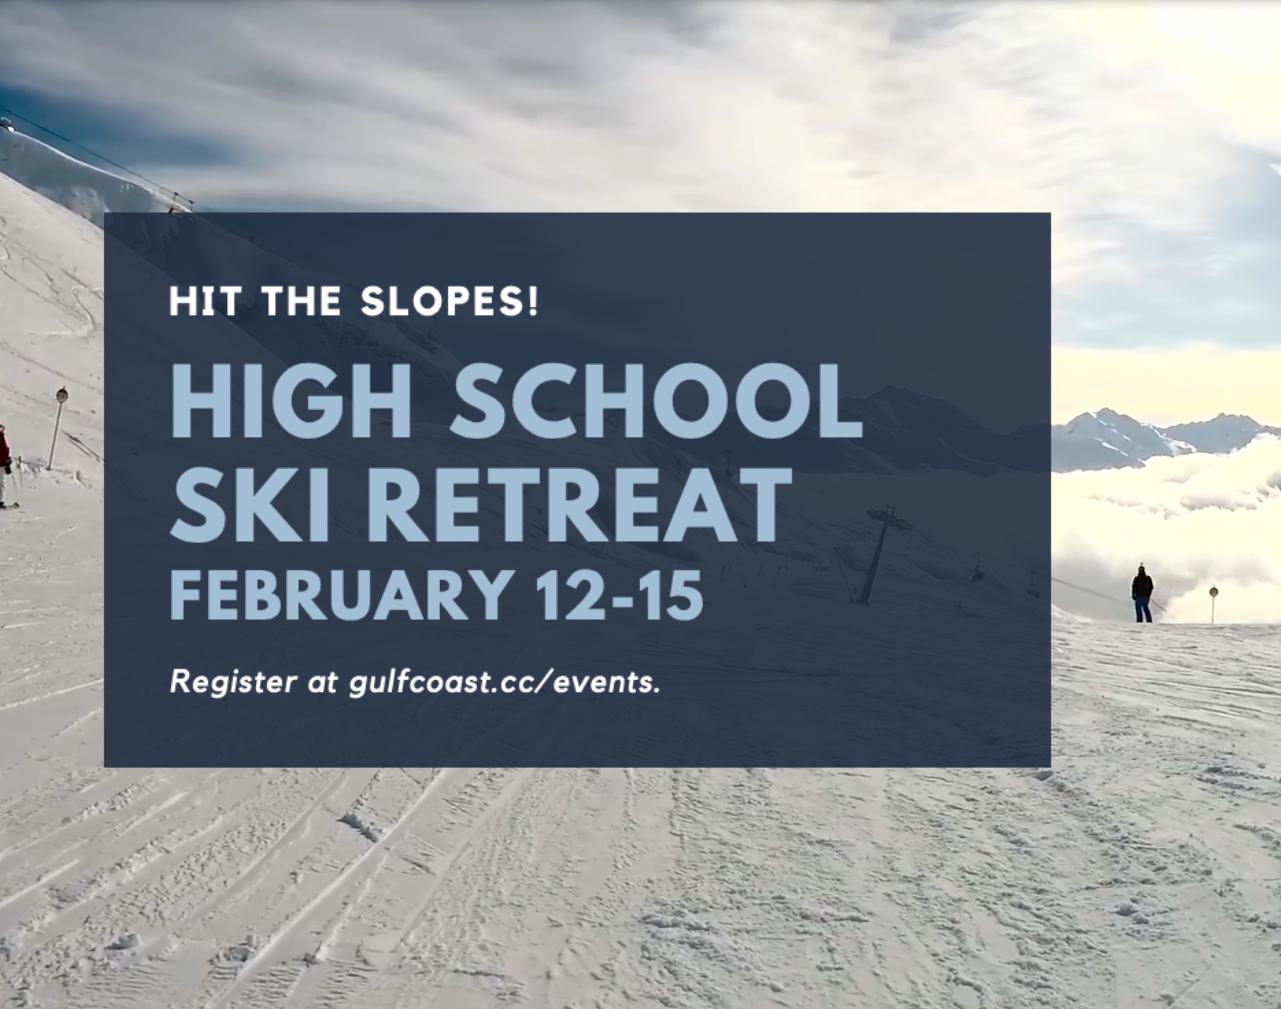 High School Ski Retreat